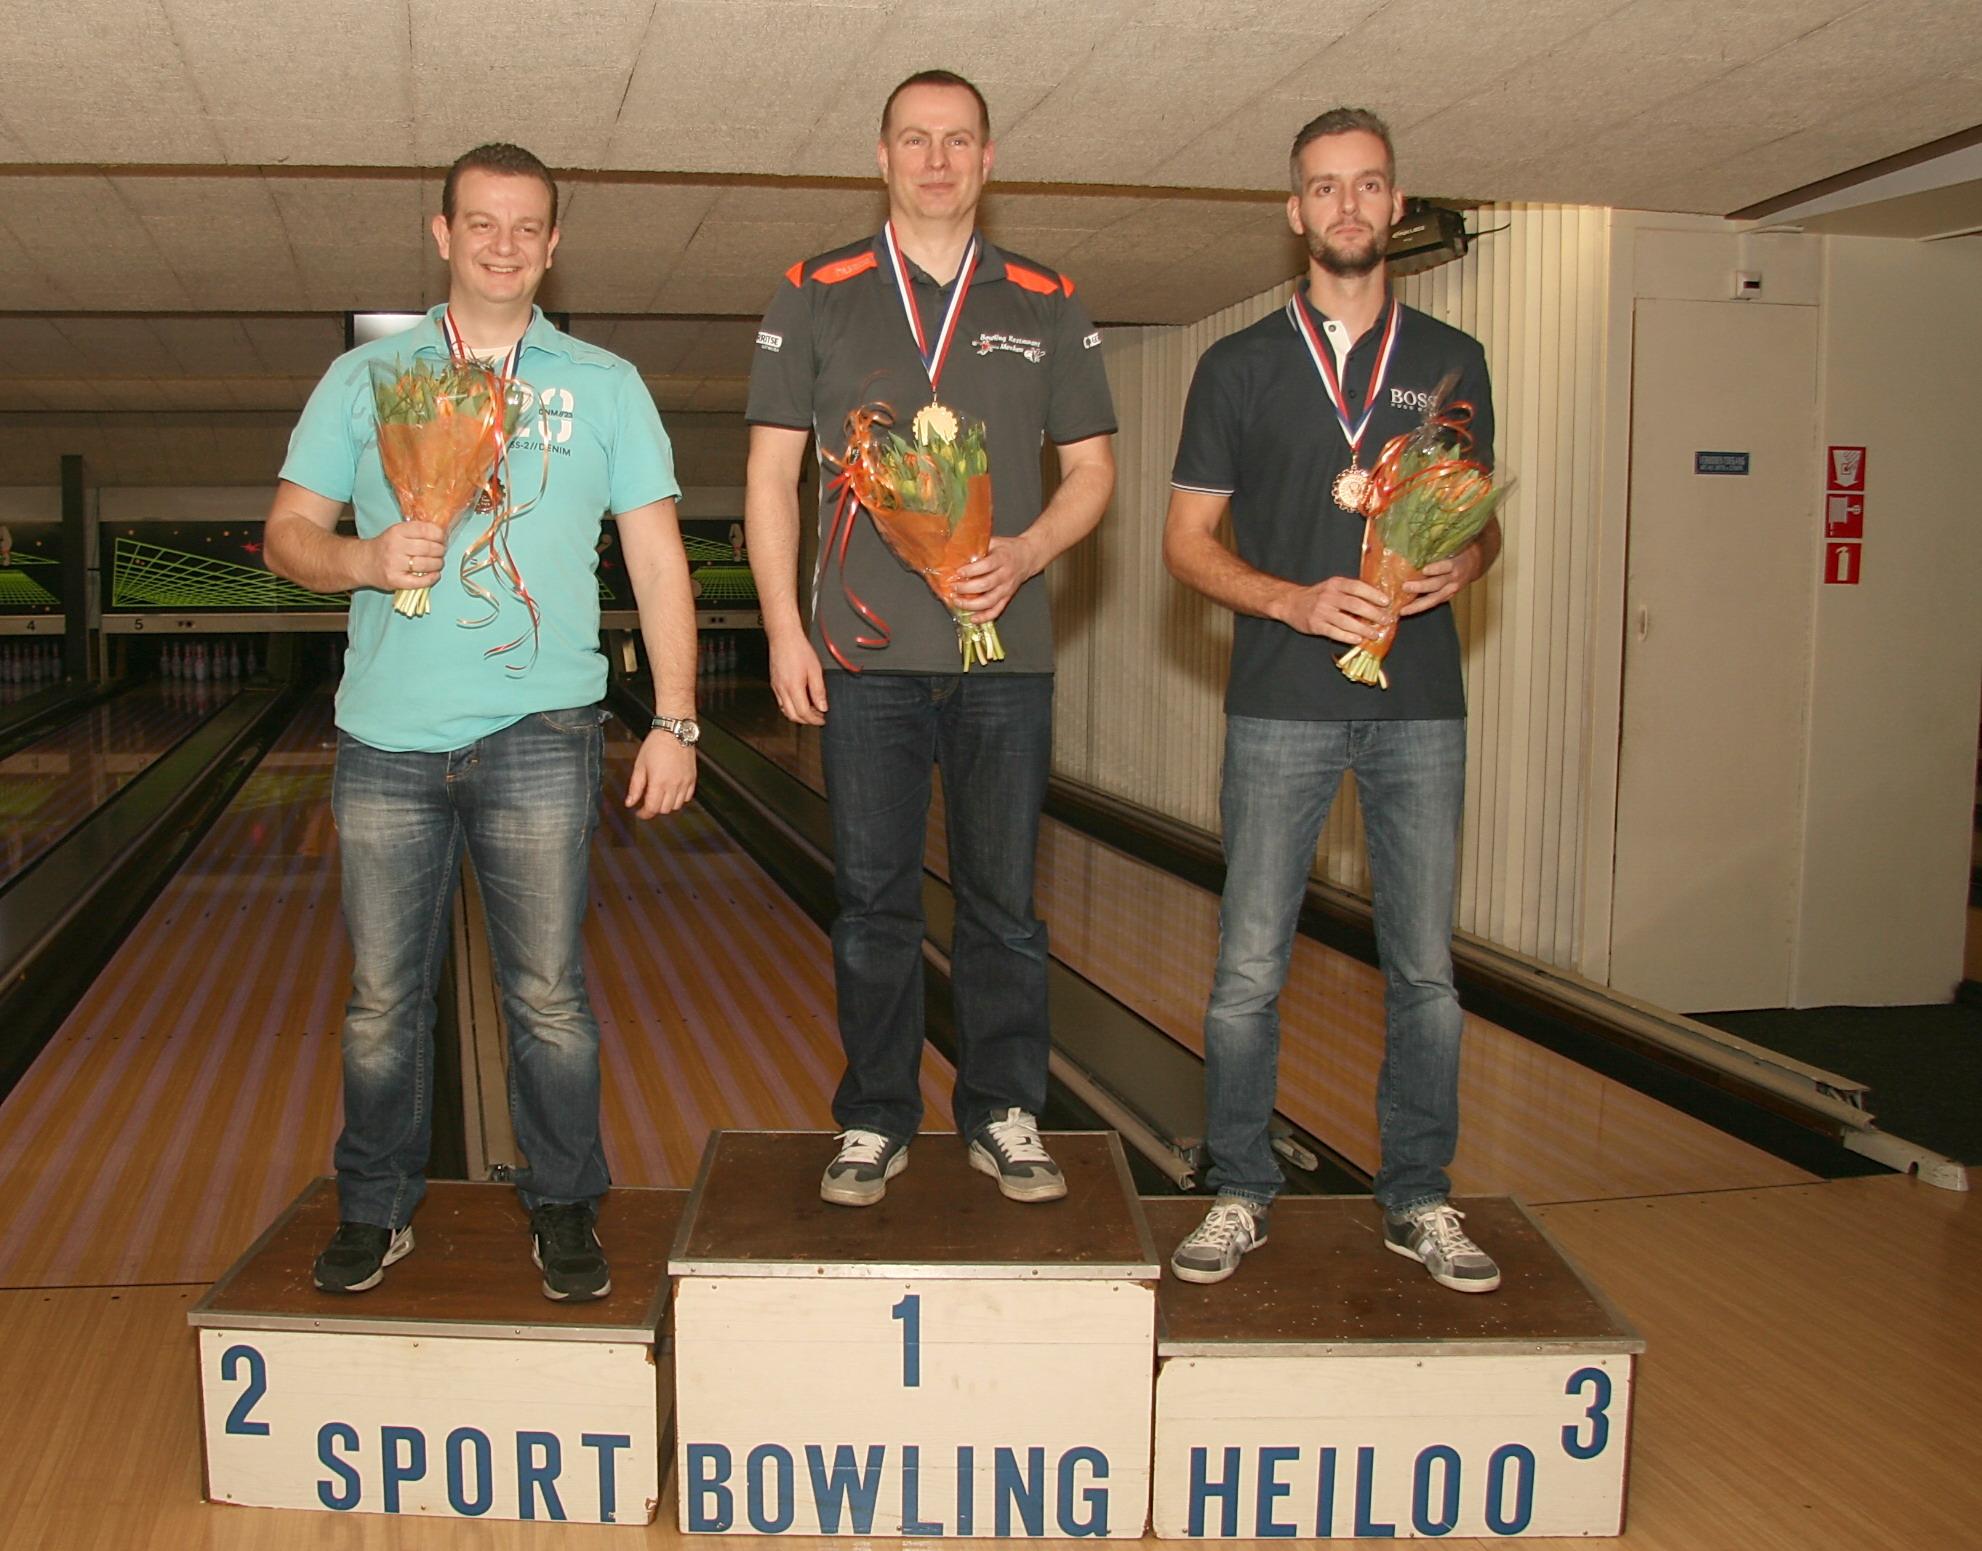 http://www.bowlingverenigingheiloo.nl/fotos_verhalen/foto's/2013_0214-Ver.kamp-Heren-B.jpg